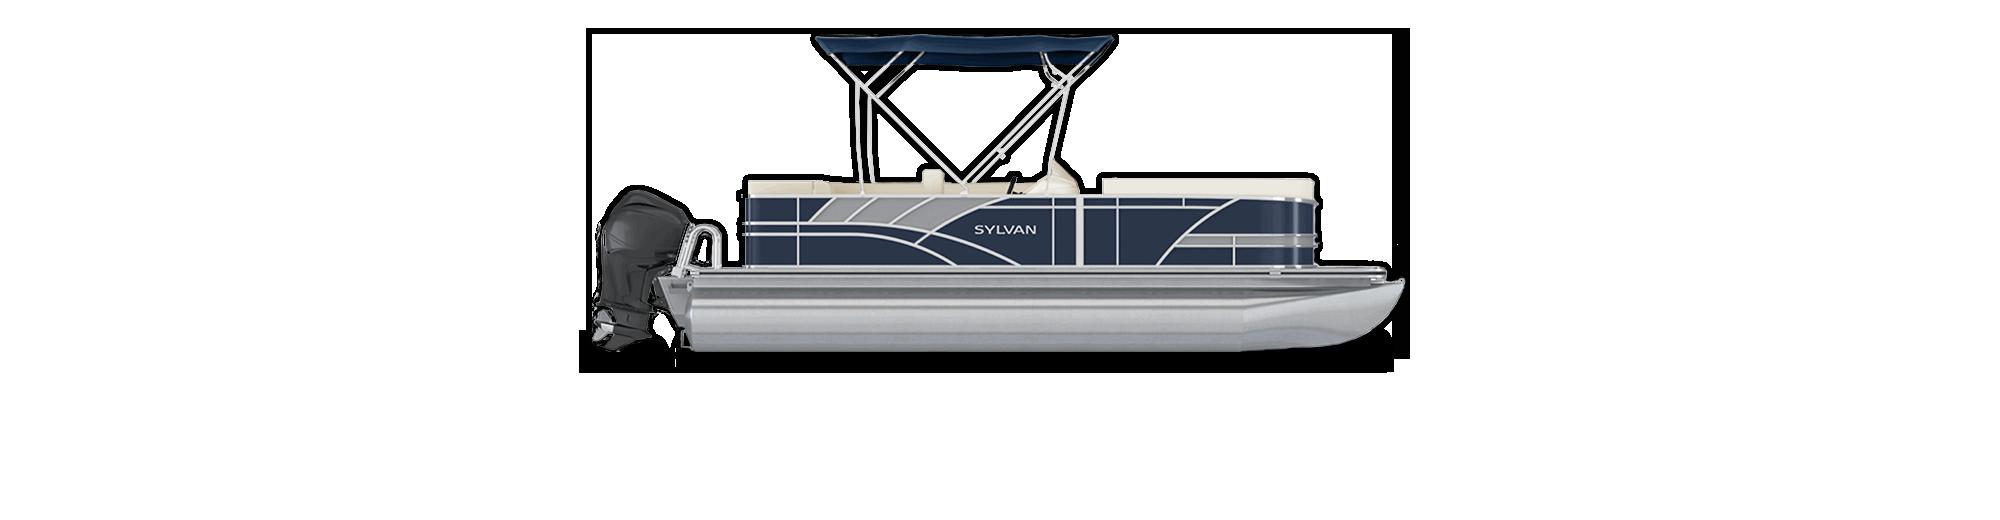 Shop Sylvan Boats Now